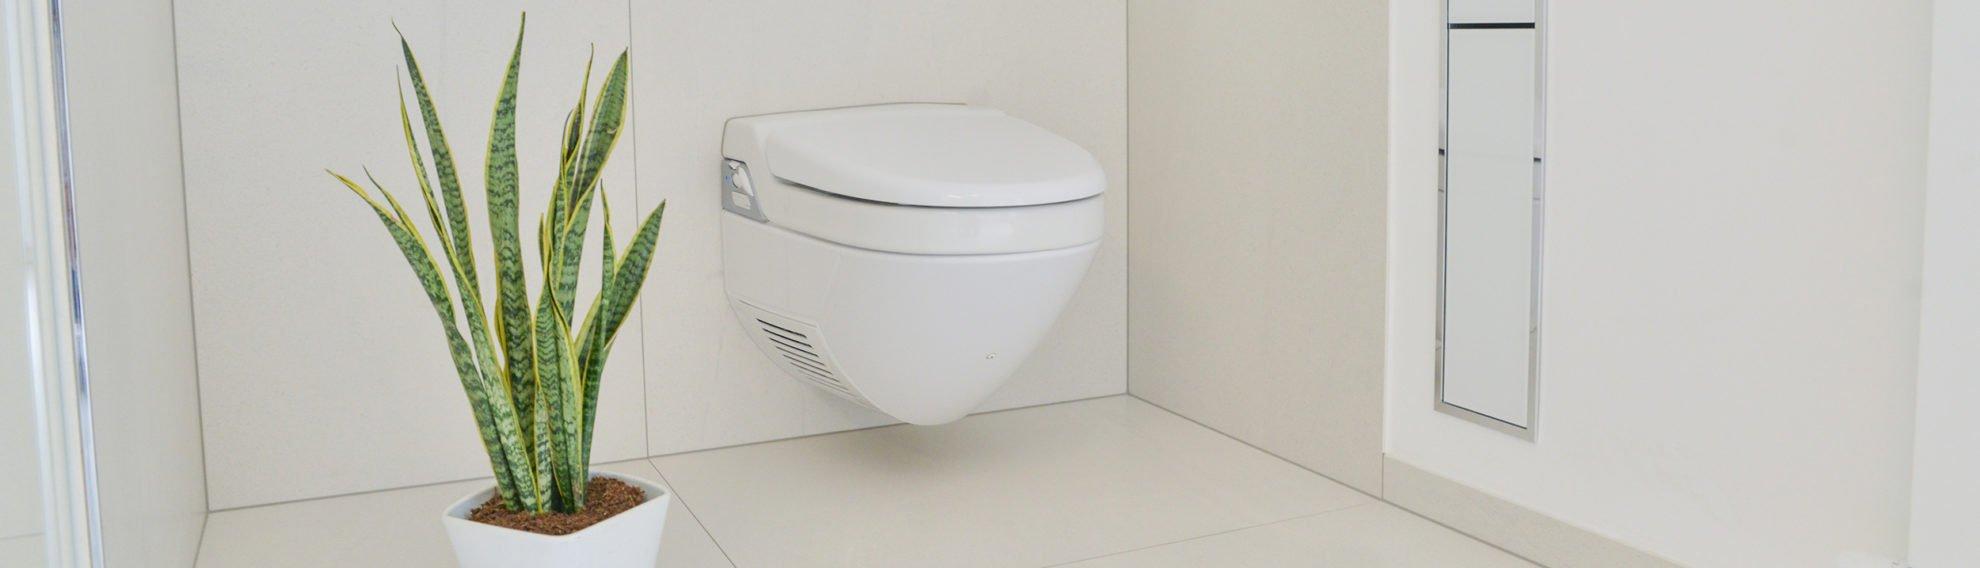 NOWAK-Badezimmer-Design-Komfort-WC-Toilette | NOWAK GmbH ...